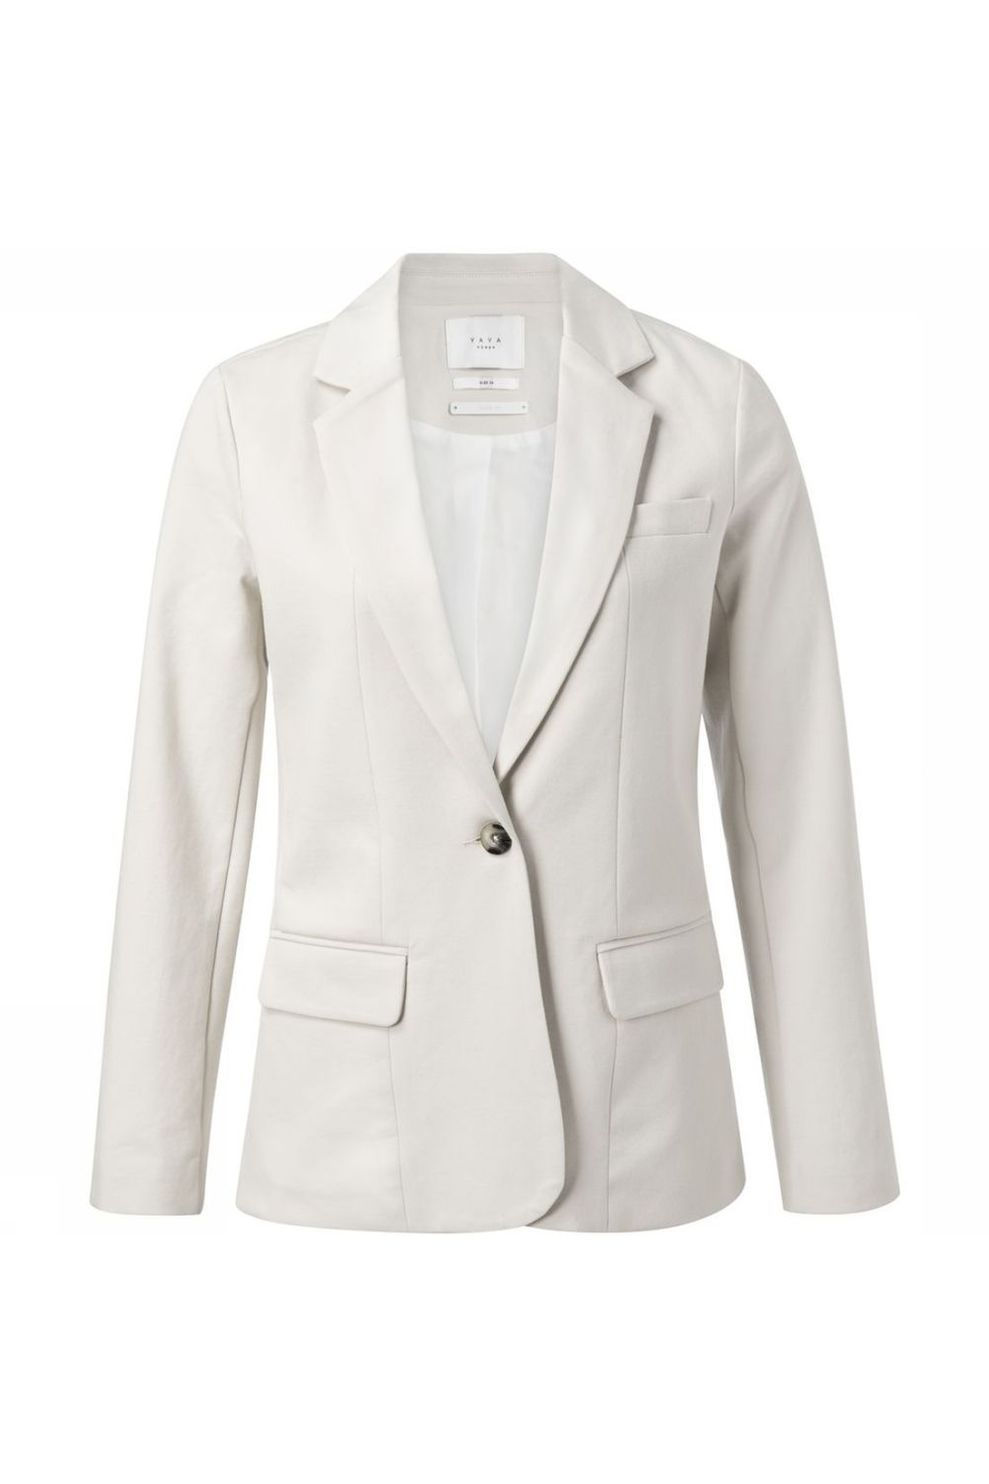 YAYA Blazer Jersey Tailored voor dames - Wit - Maten: 34, 36, 38, 40, 42